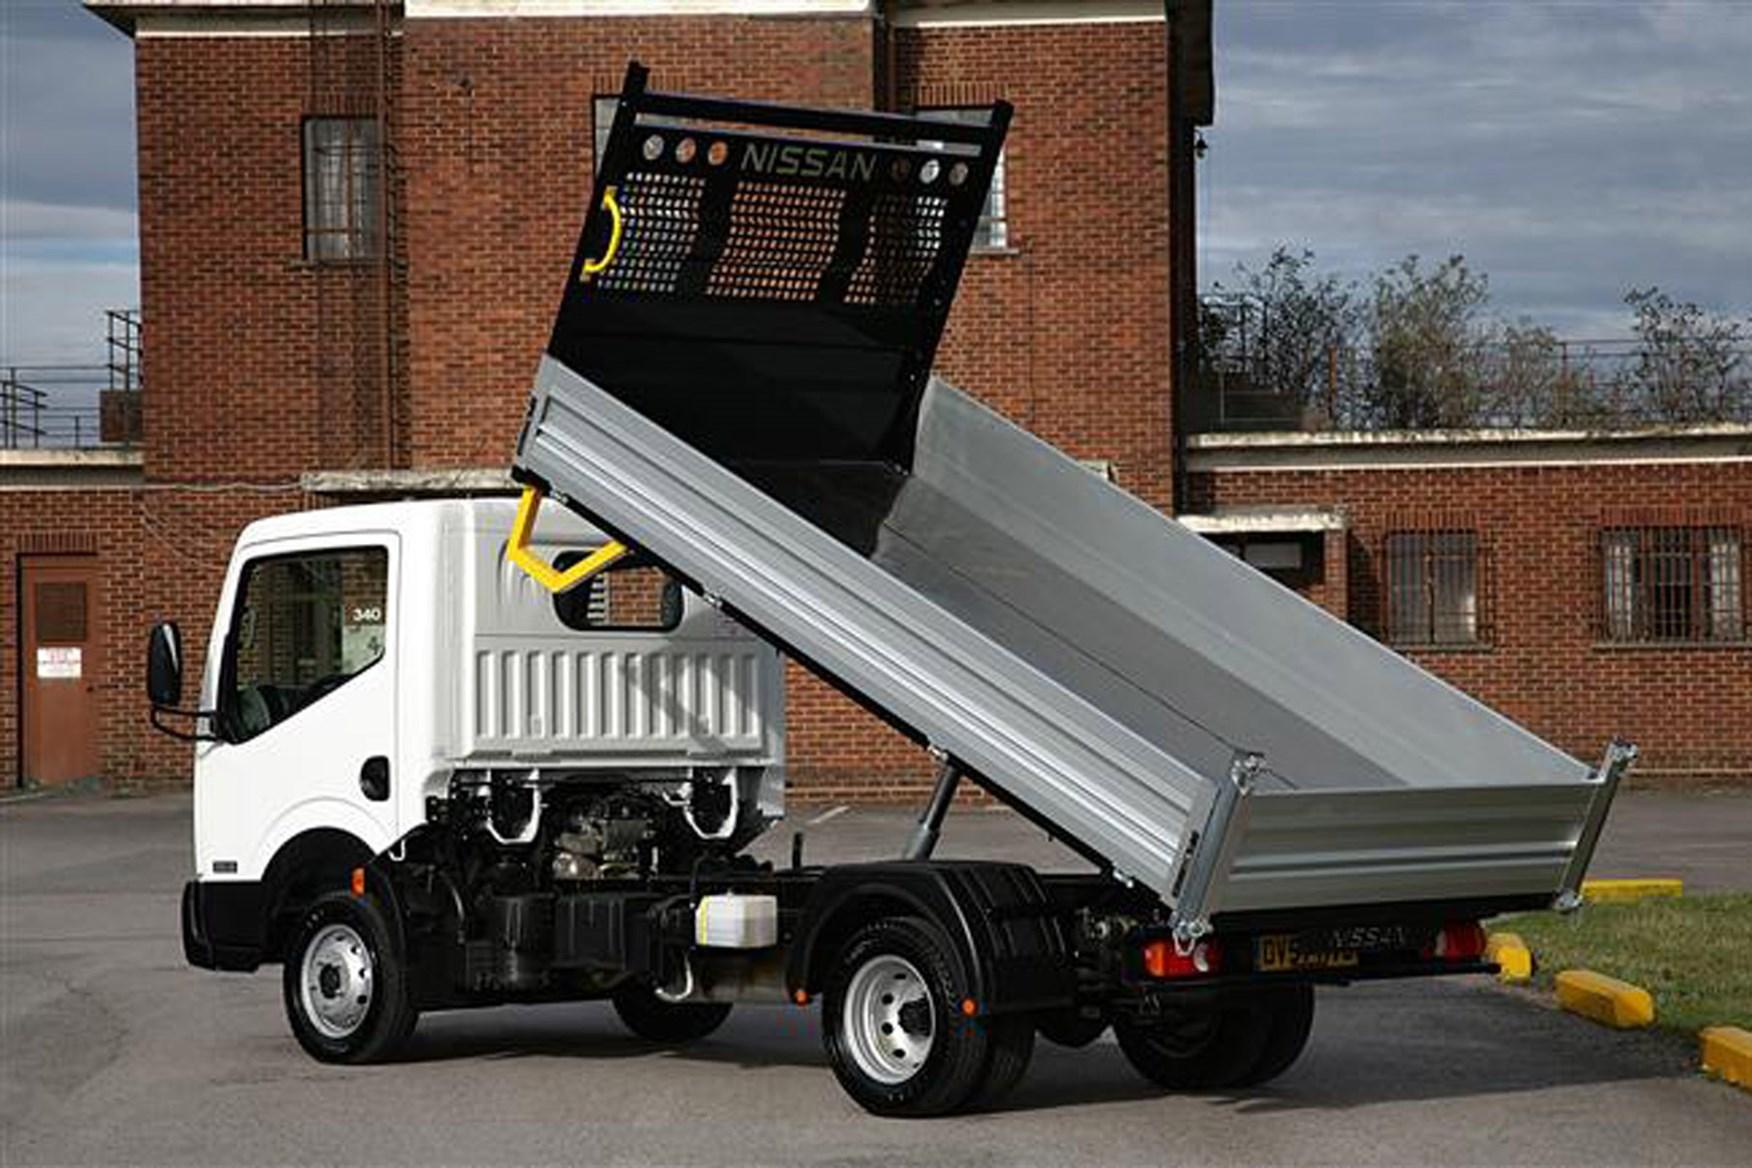 Nissan Cabstar review on Parkers Vans - drop side load area